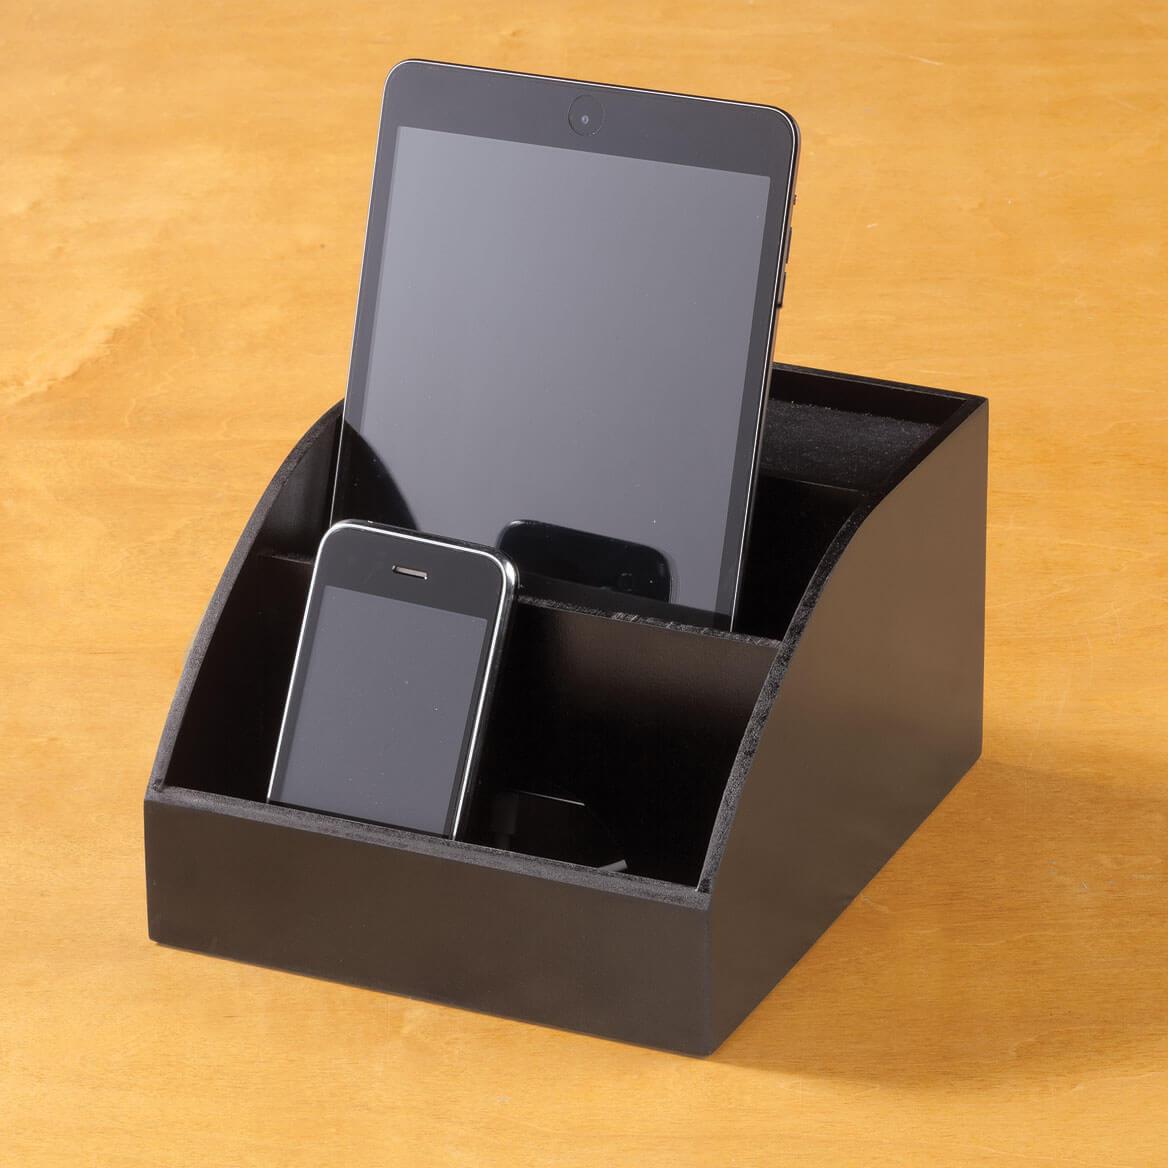 desktop electronic charging station organizer miles kimball. Black Bedroom Furniture Sets. Home Design Ideas